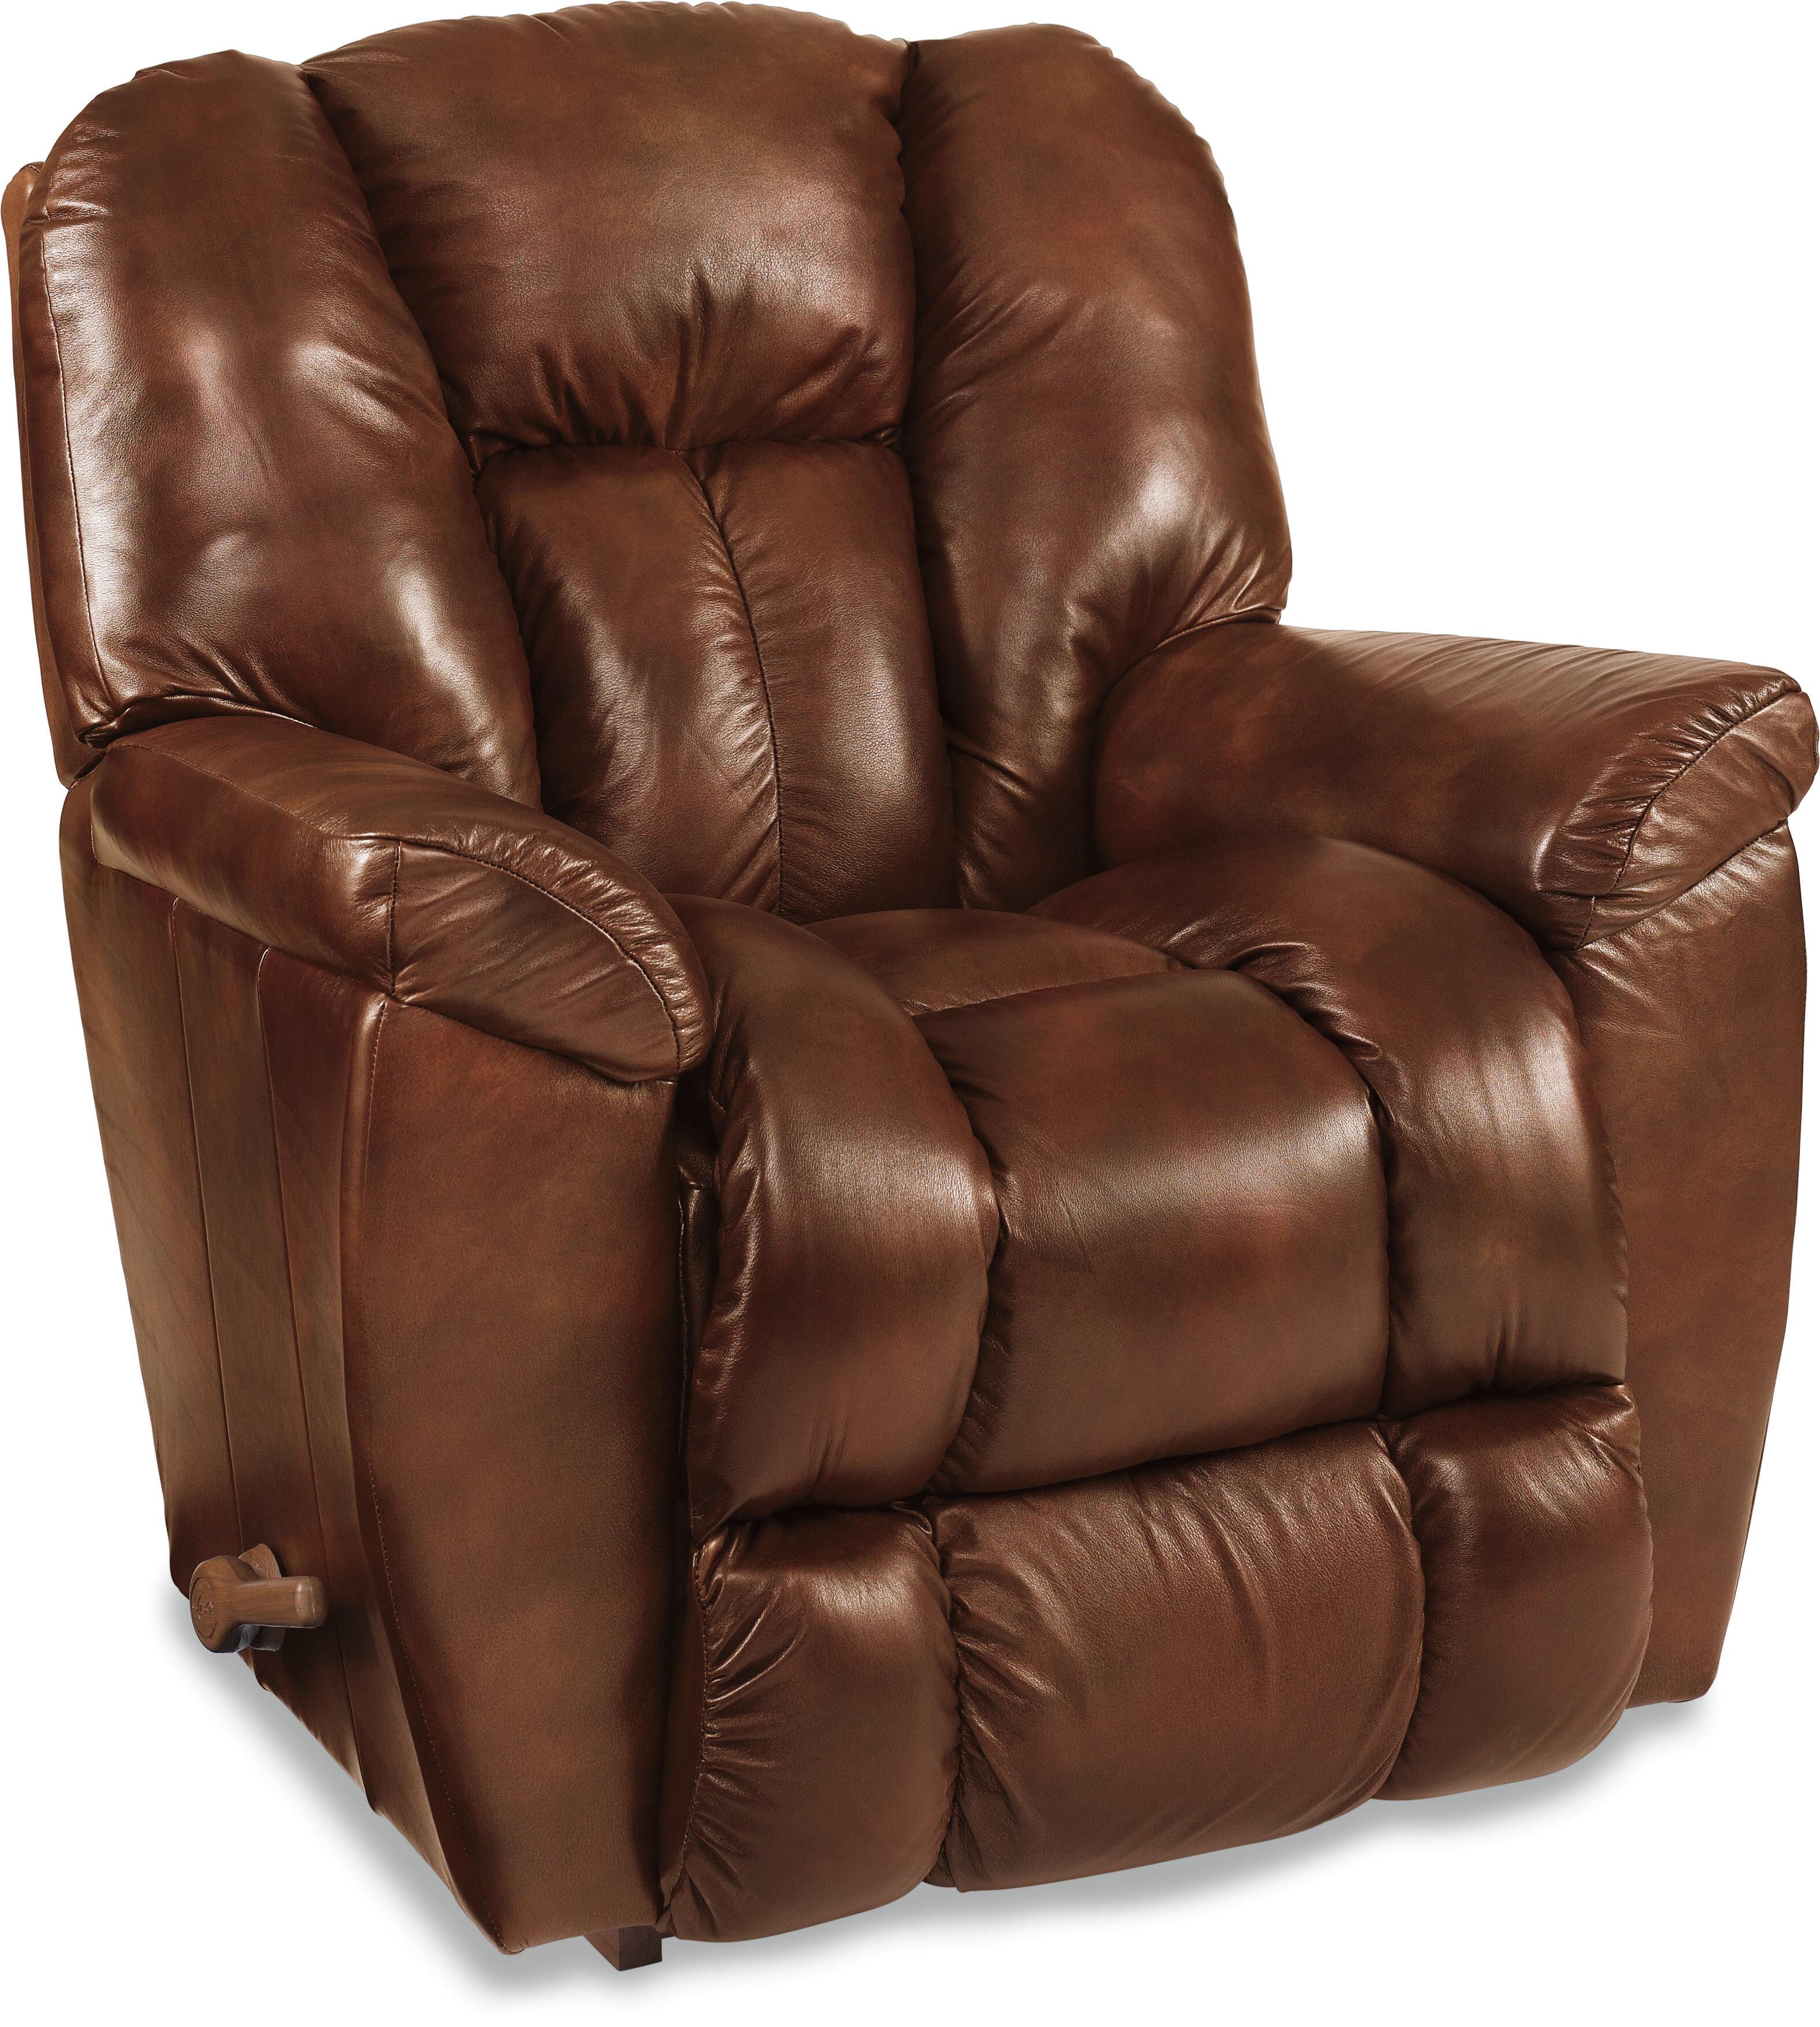 La Z Boy Maverick Leather Recliner U0026 Reviews   Wayfair